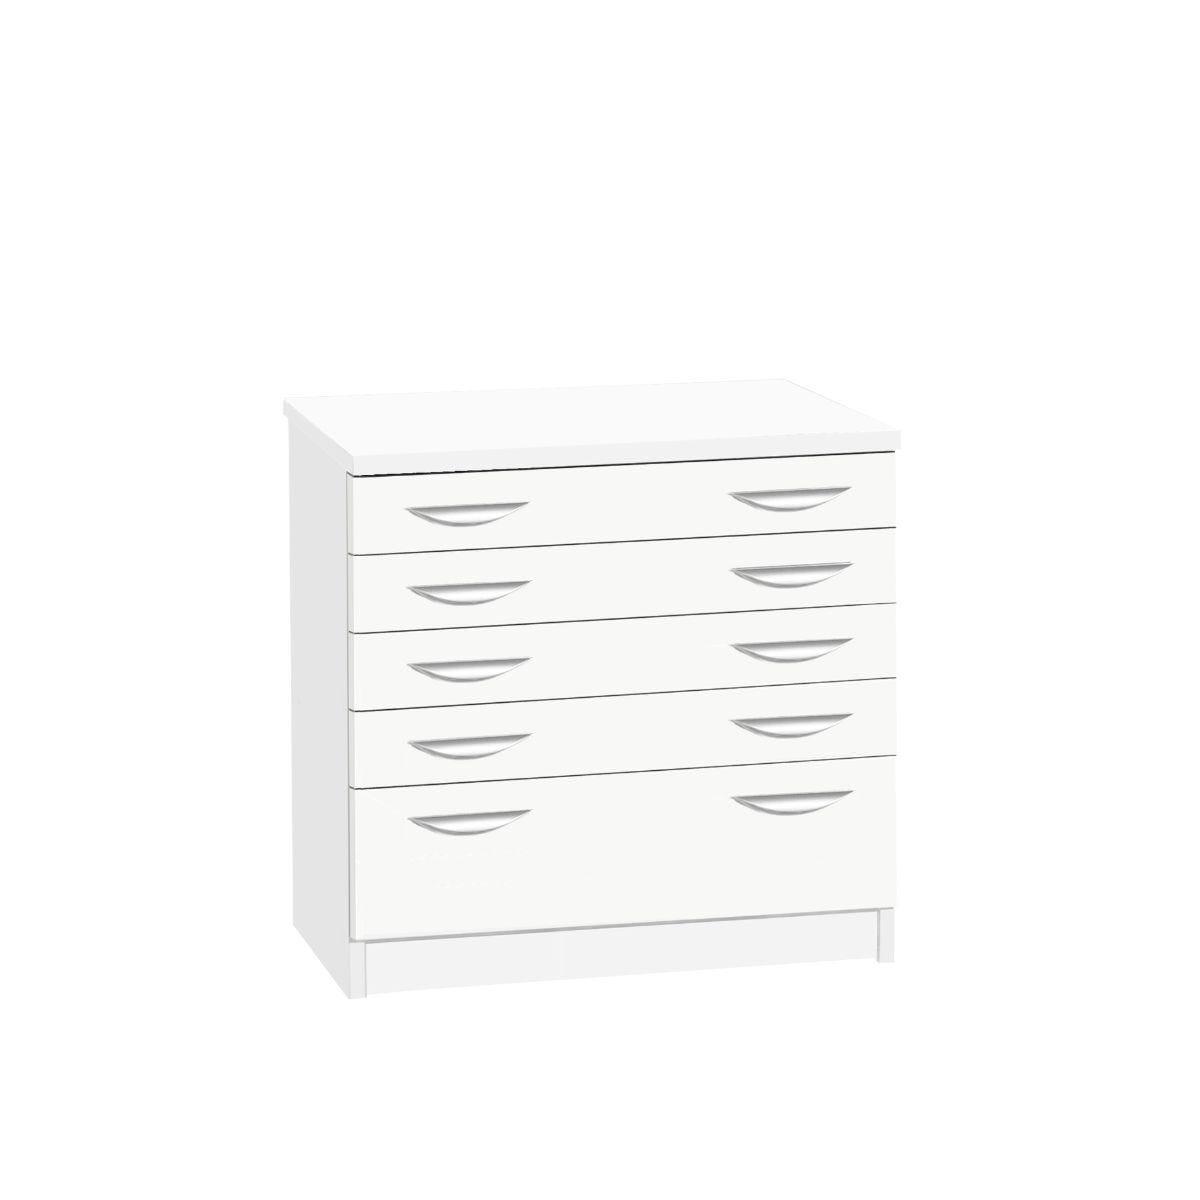 R White Professional 5 Drawer A2 Plan Chest White Satin